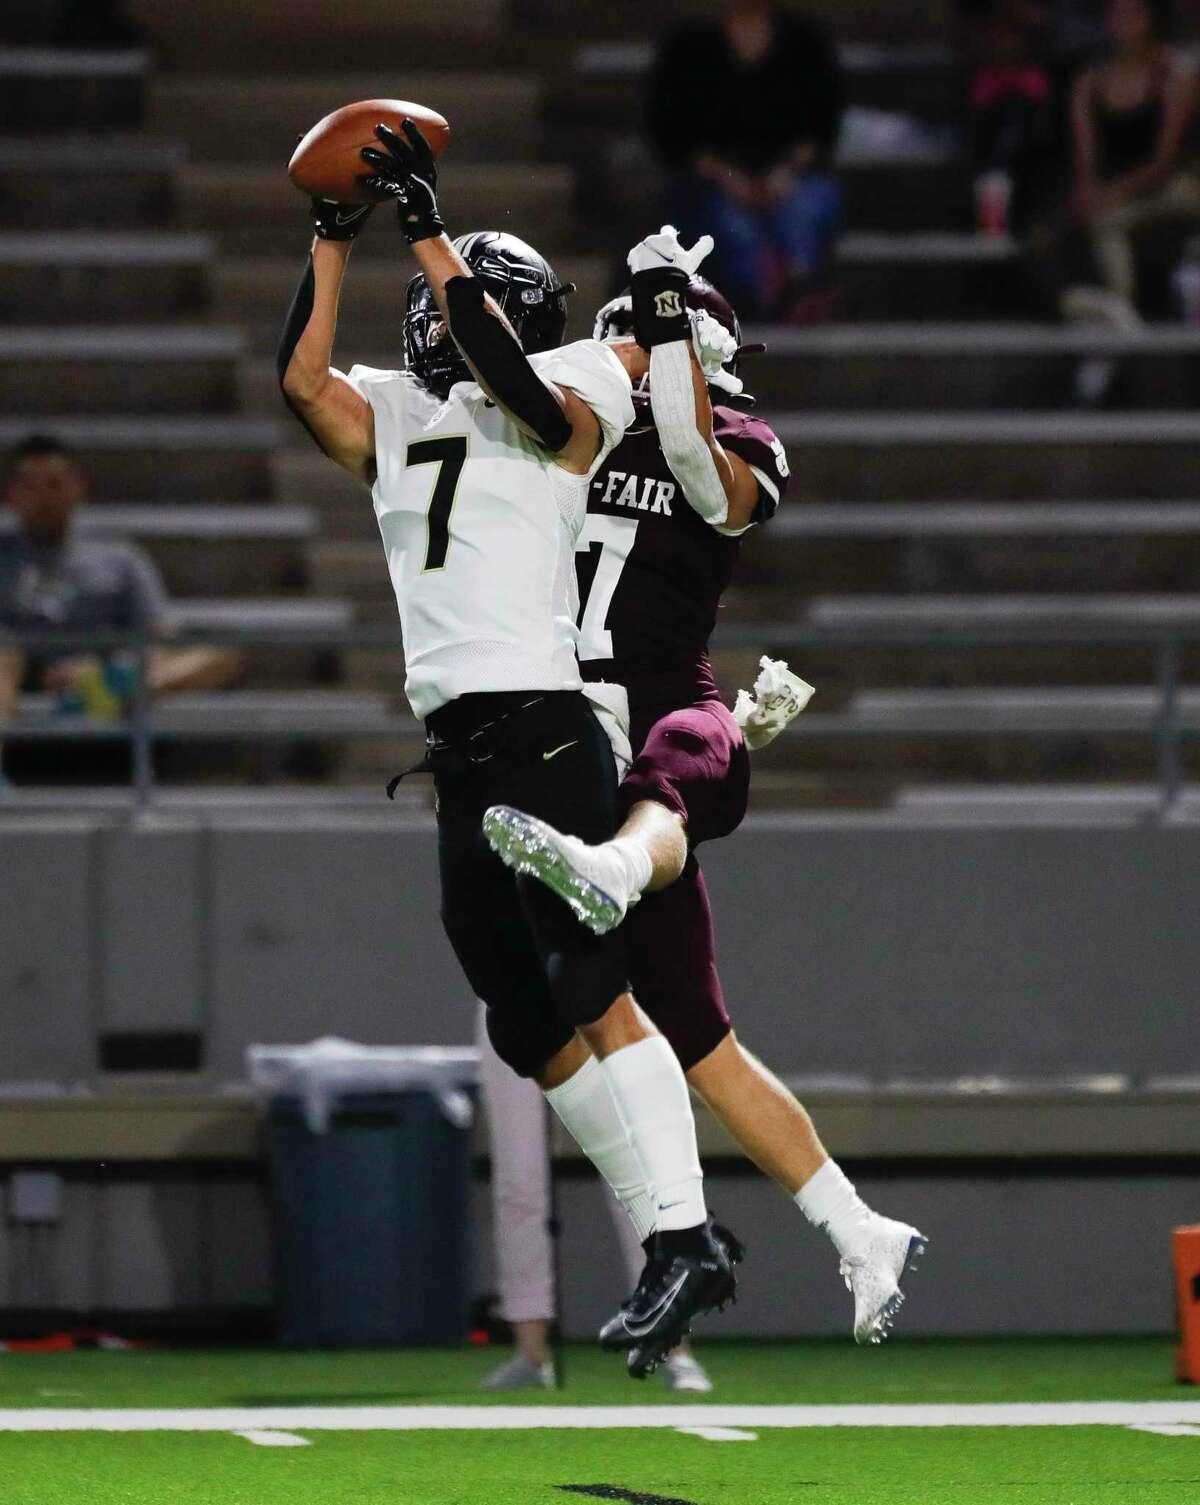 Cypress Park defensive back Raymond Davis (7) intercepts a pass by Cy-Fair quarterback Tristen DeLaCruz and returns it for a 89-yard touchdown during the third quarter of a high school football game at Pridgeon Stadium, Saturday, Sept. 4, 2021, in Cypress.